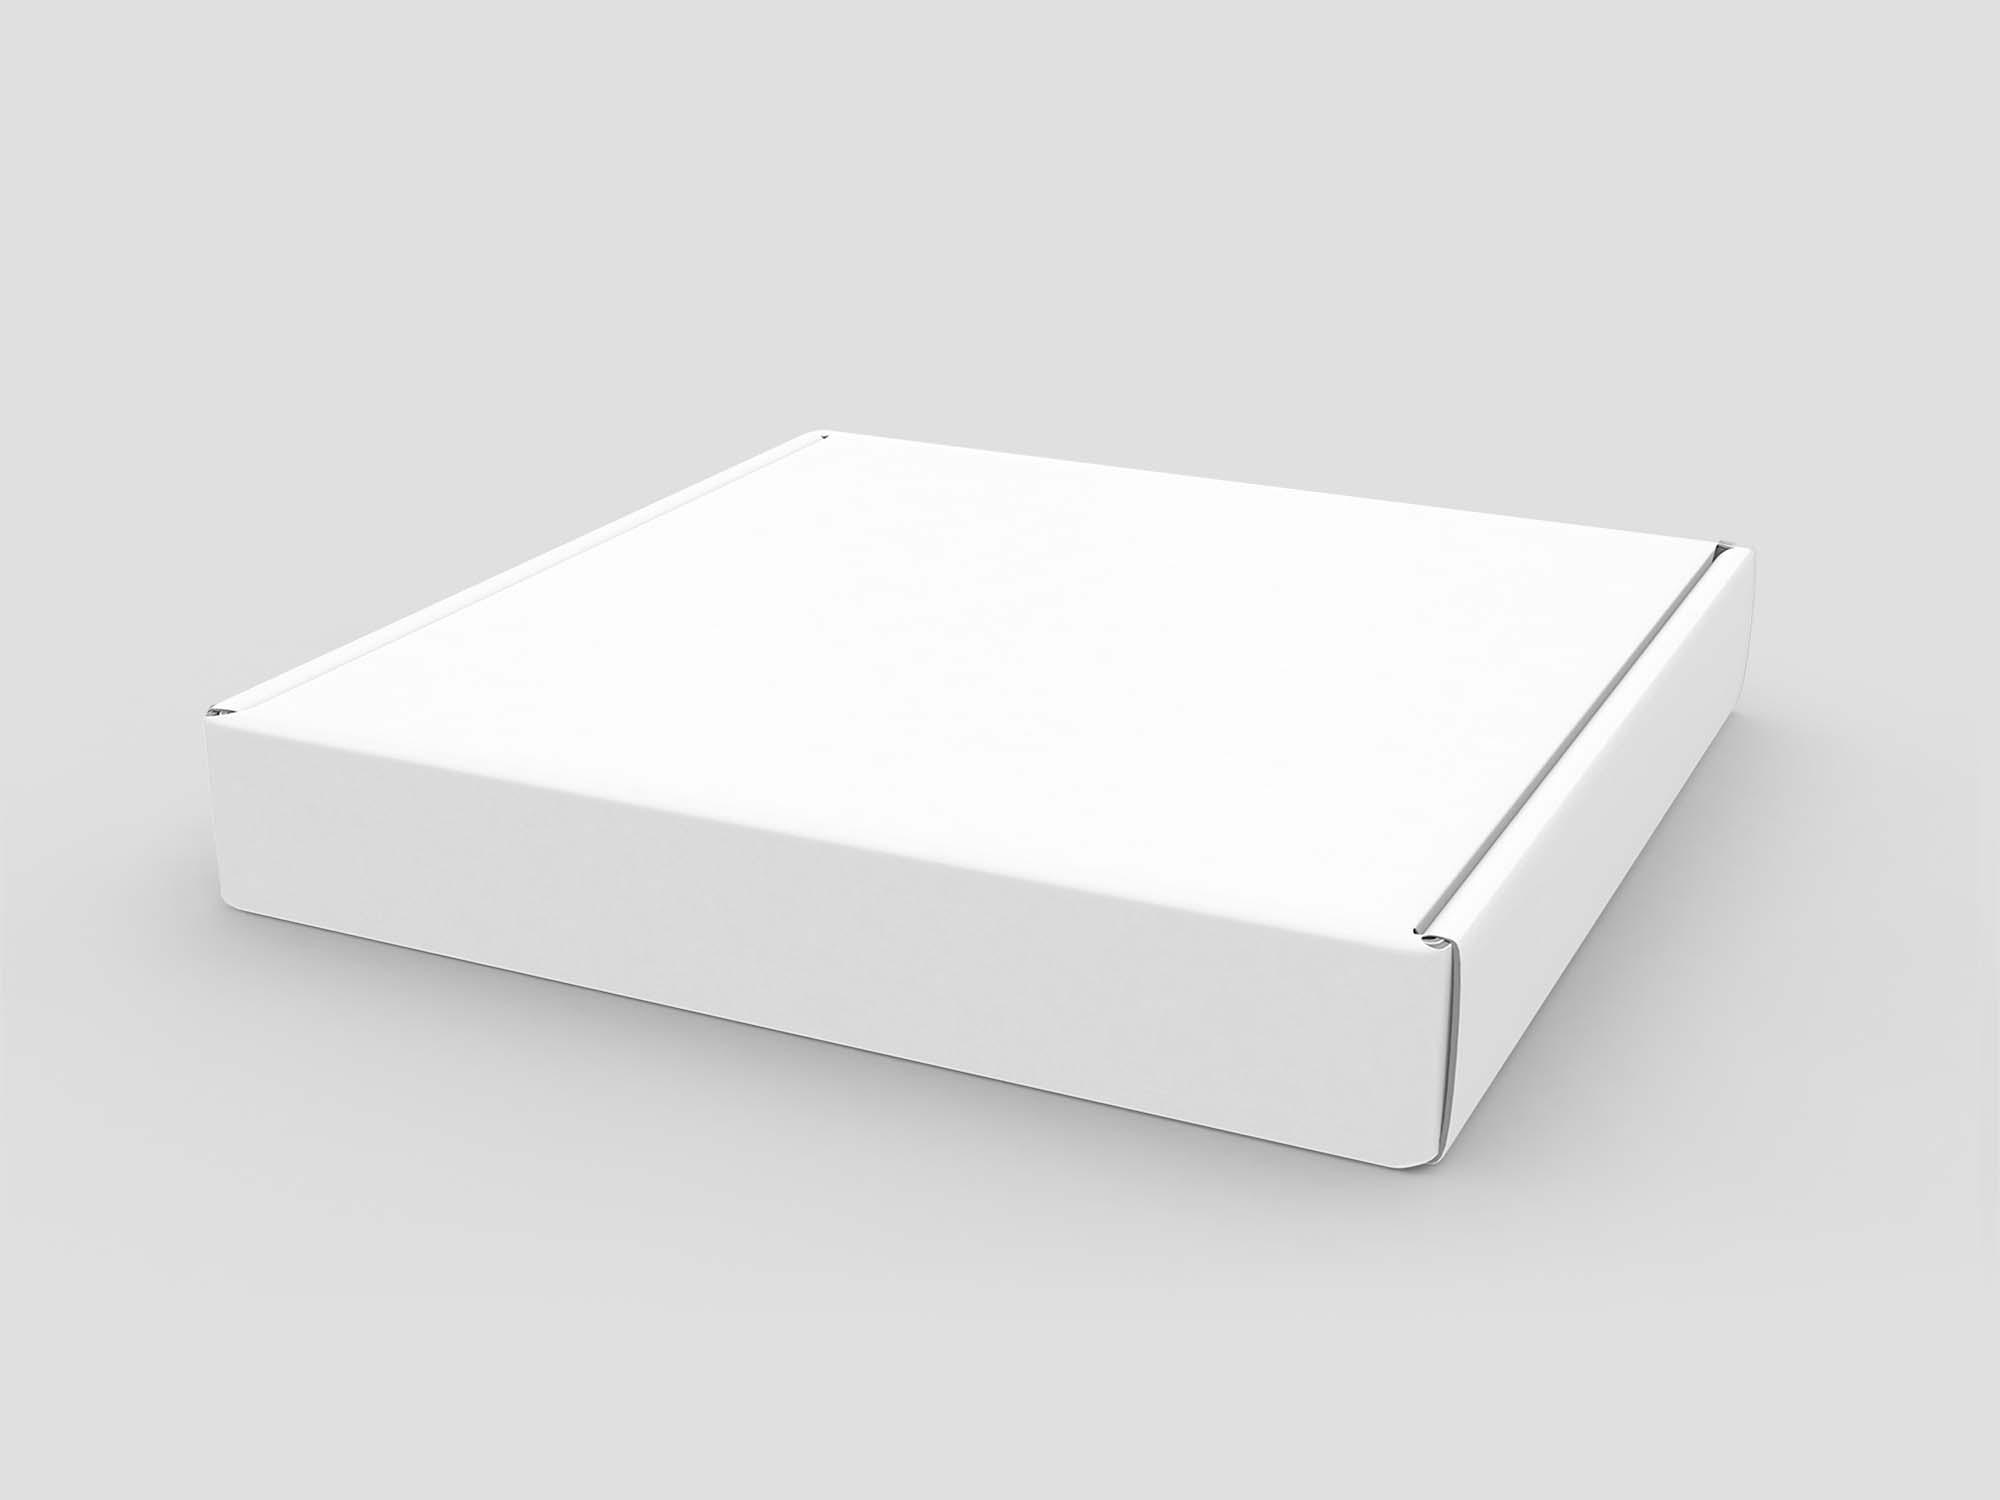 Horizontal Box Cover Mockup PSD